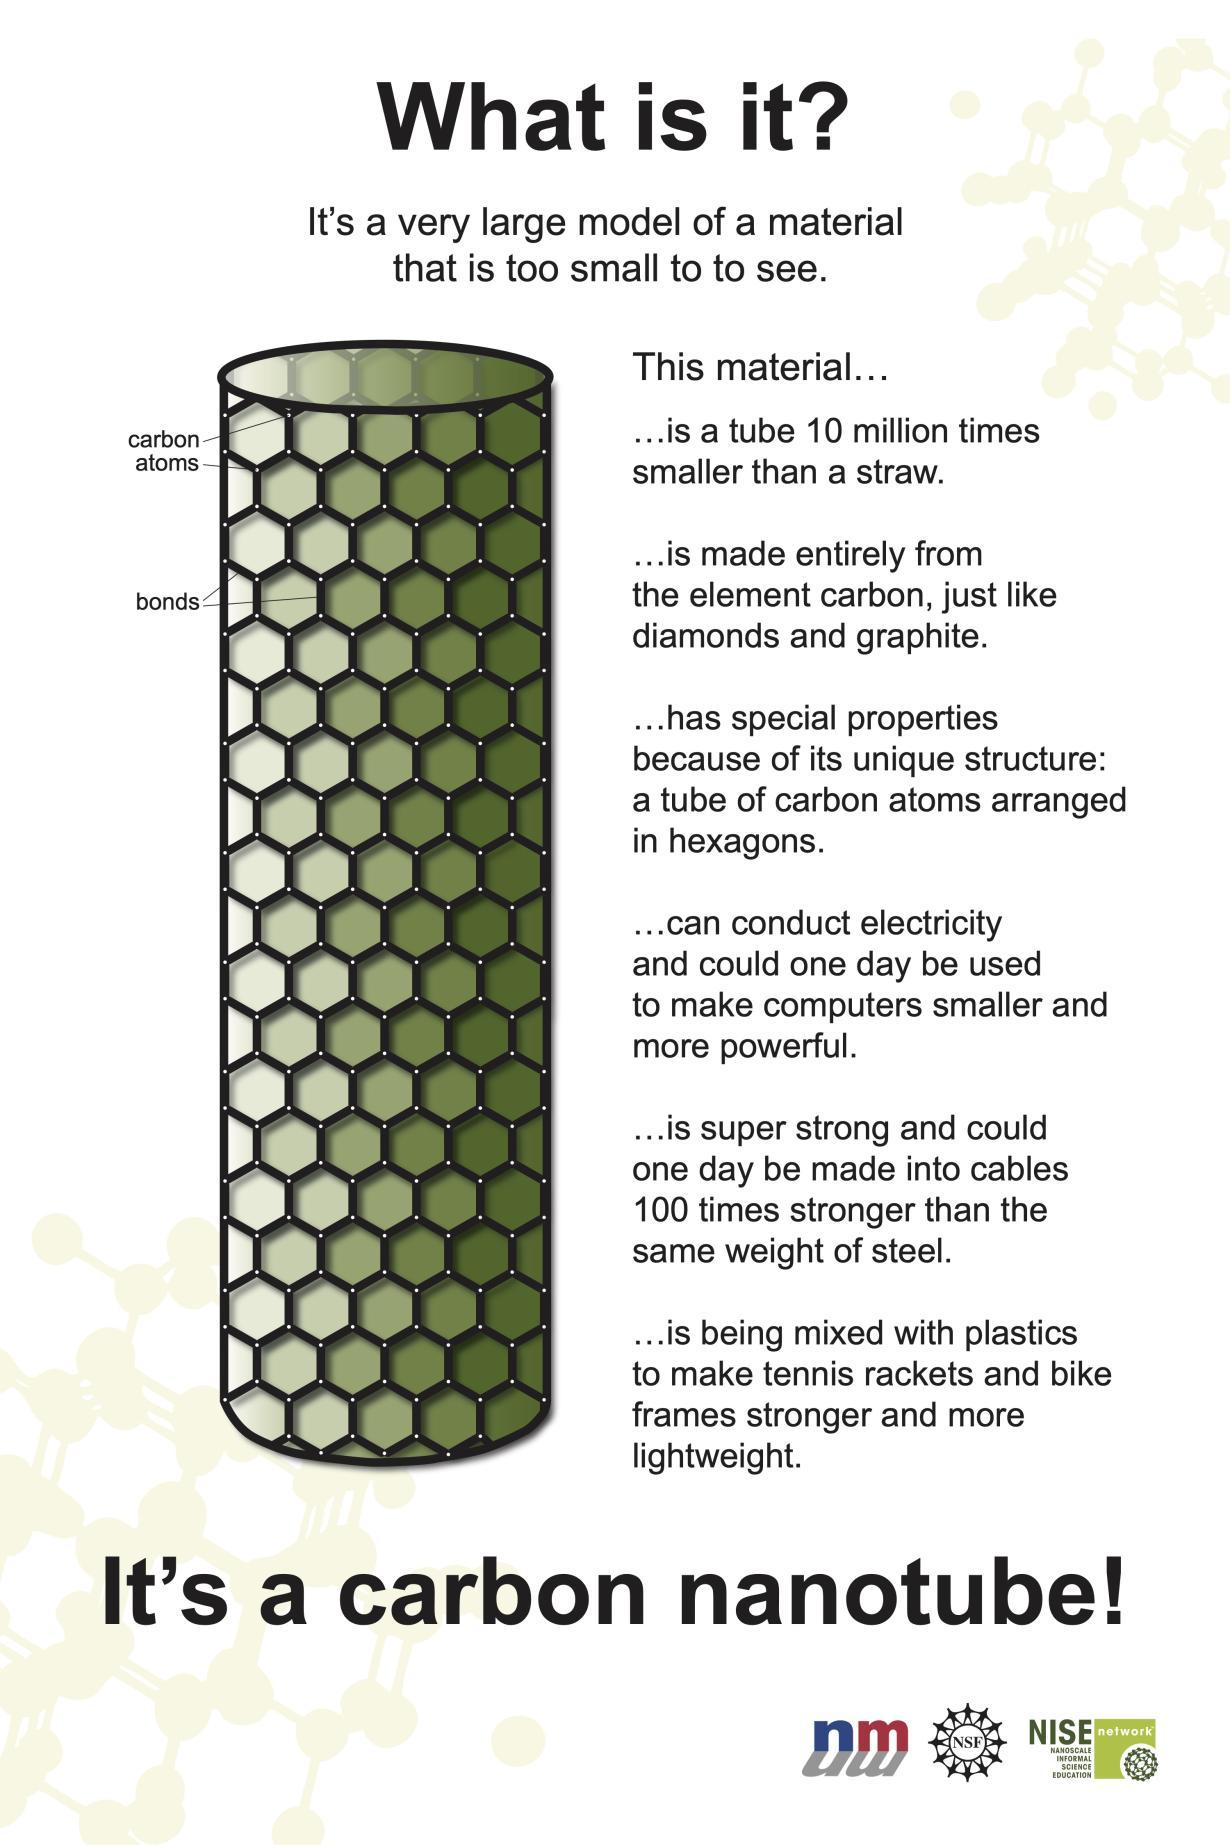 Poster of Carbon Nanotube molecule